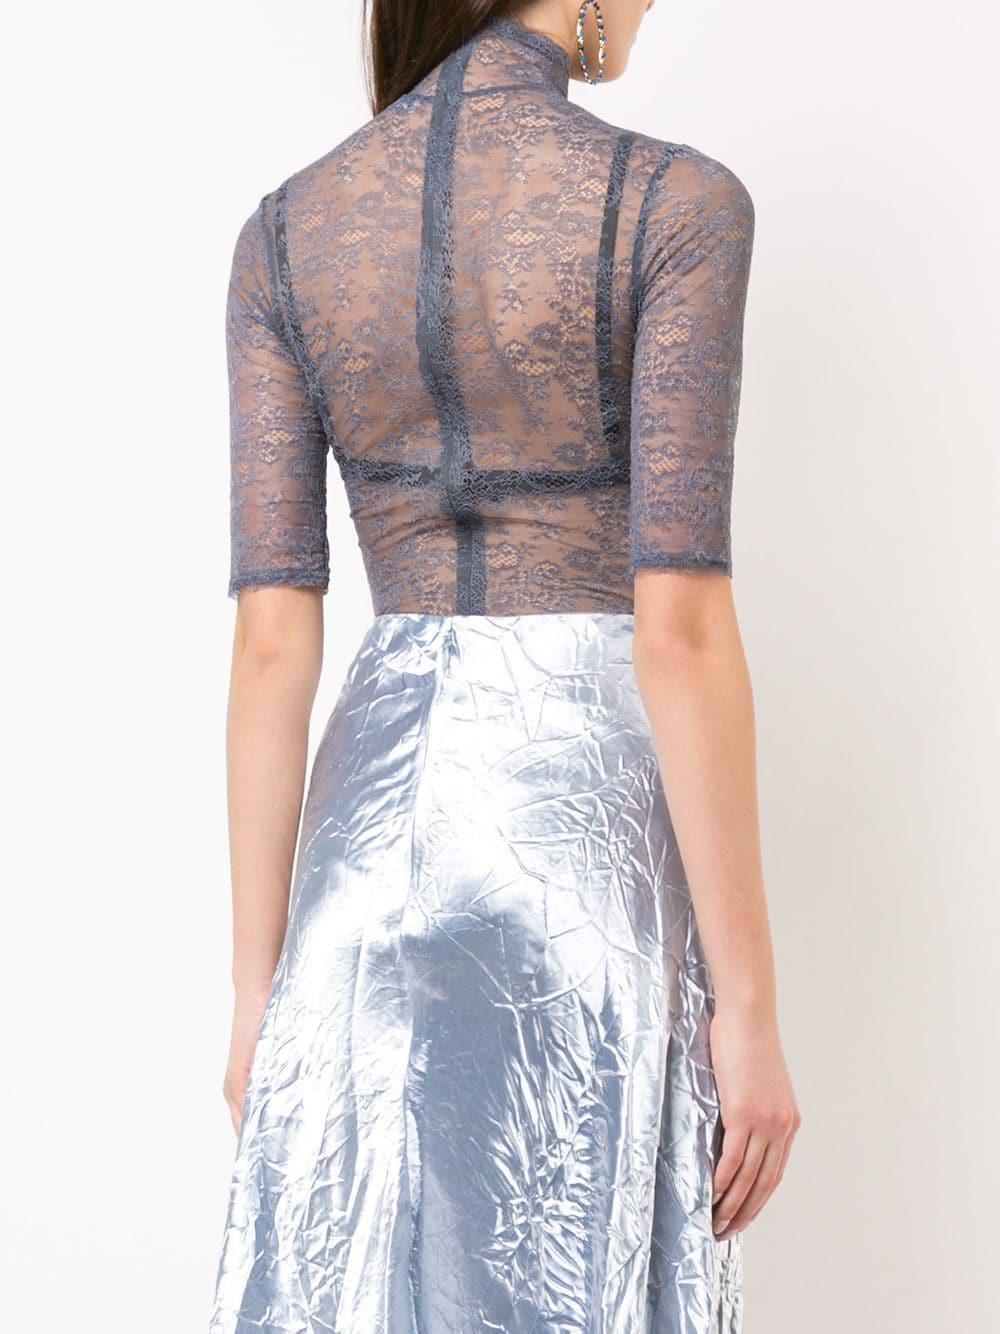 dce4882f47 Nina Ricci - Blue Sheer Embroidered Bodysuit - Lyst. View fullscreen